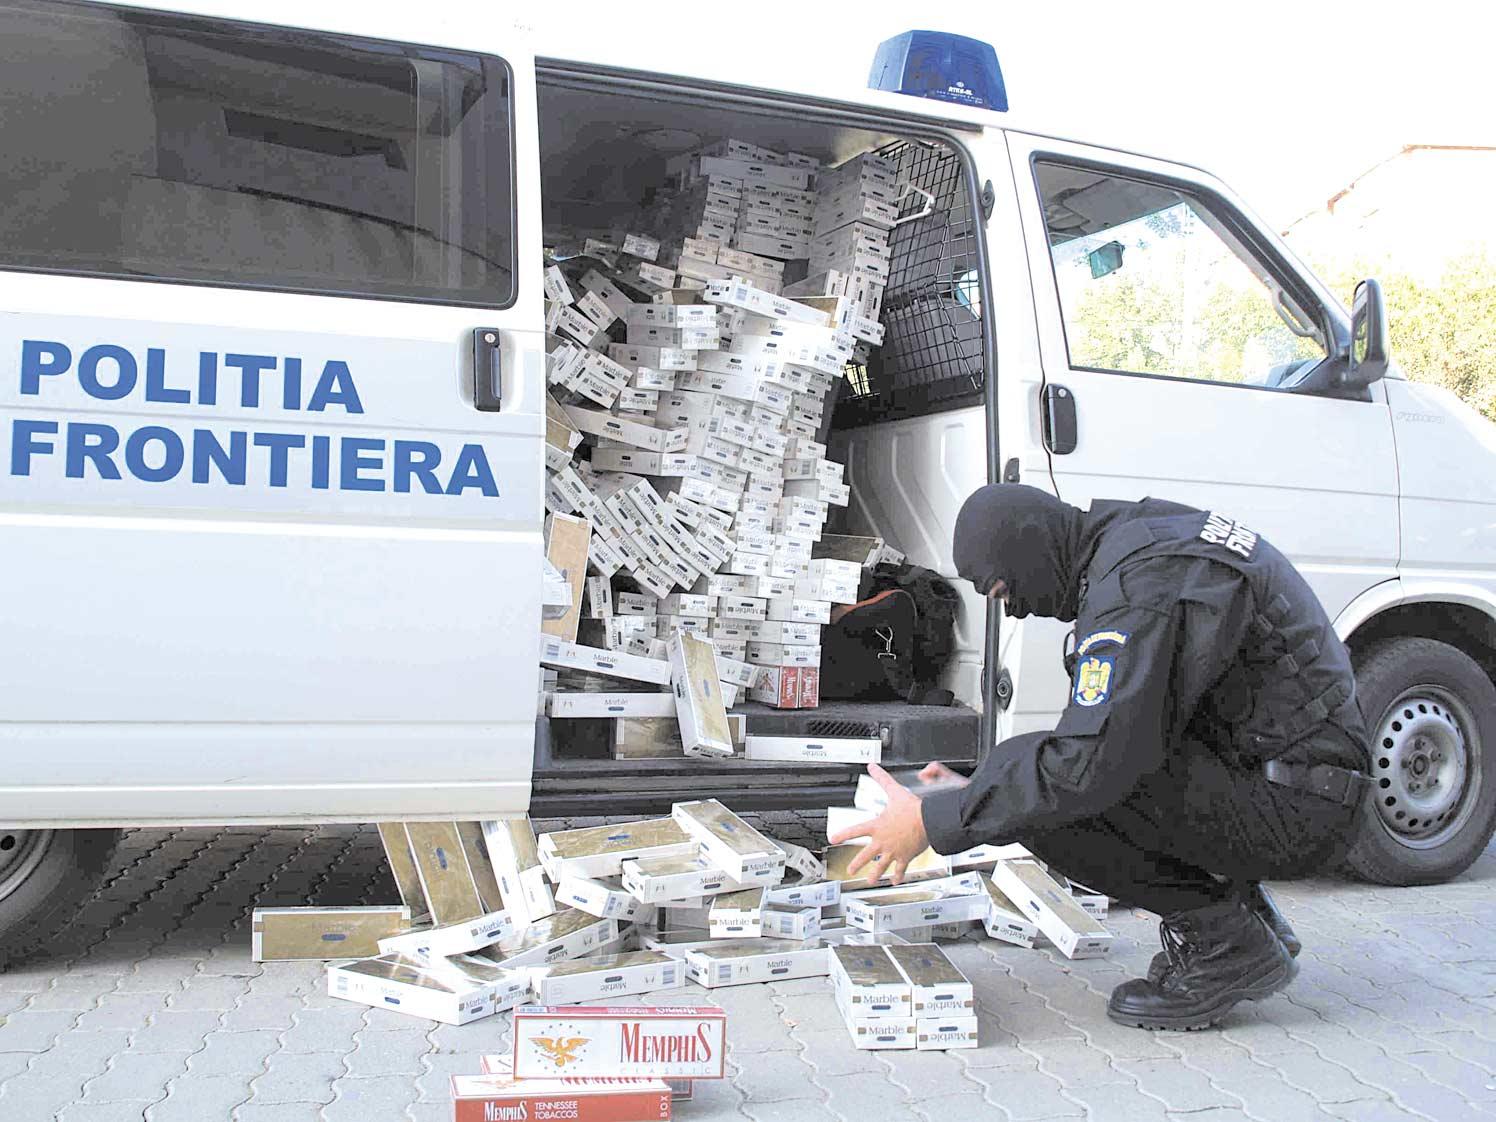 contrabandisti cu tigari